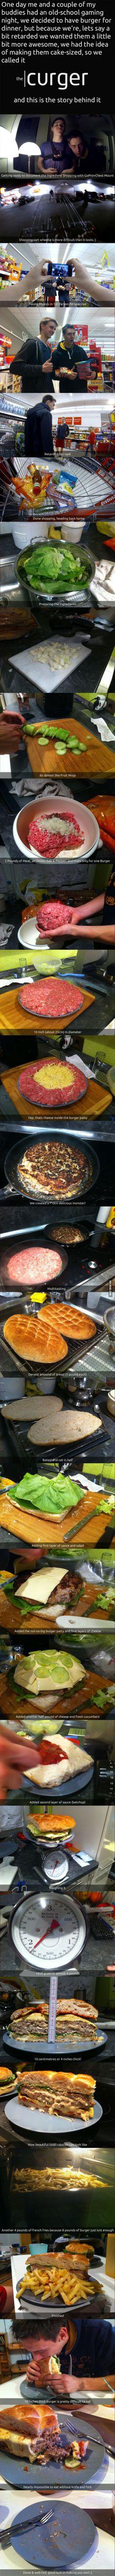 awesom burger, mega burger